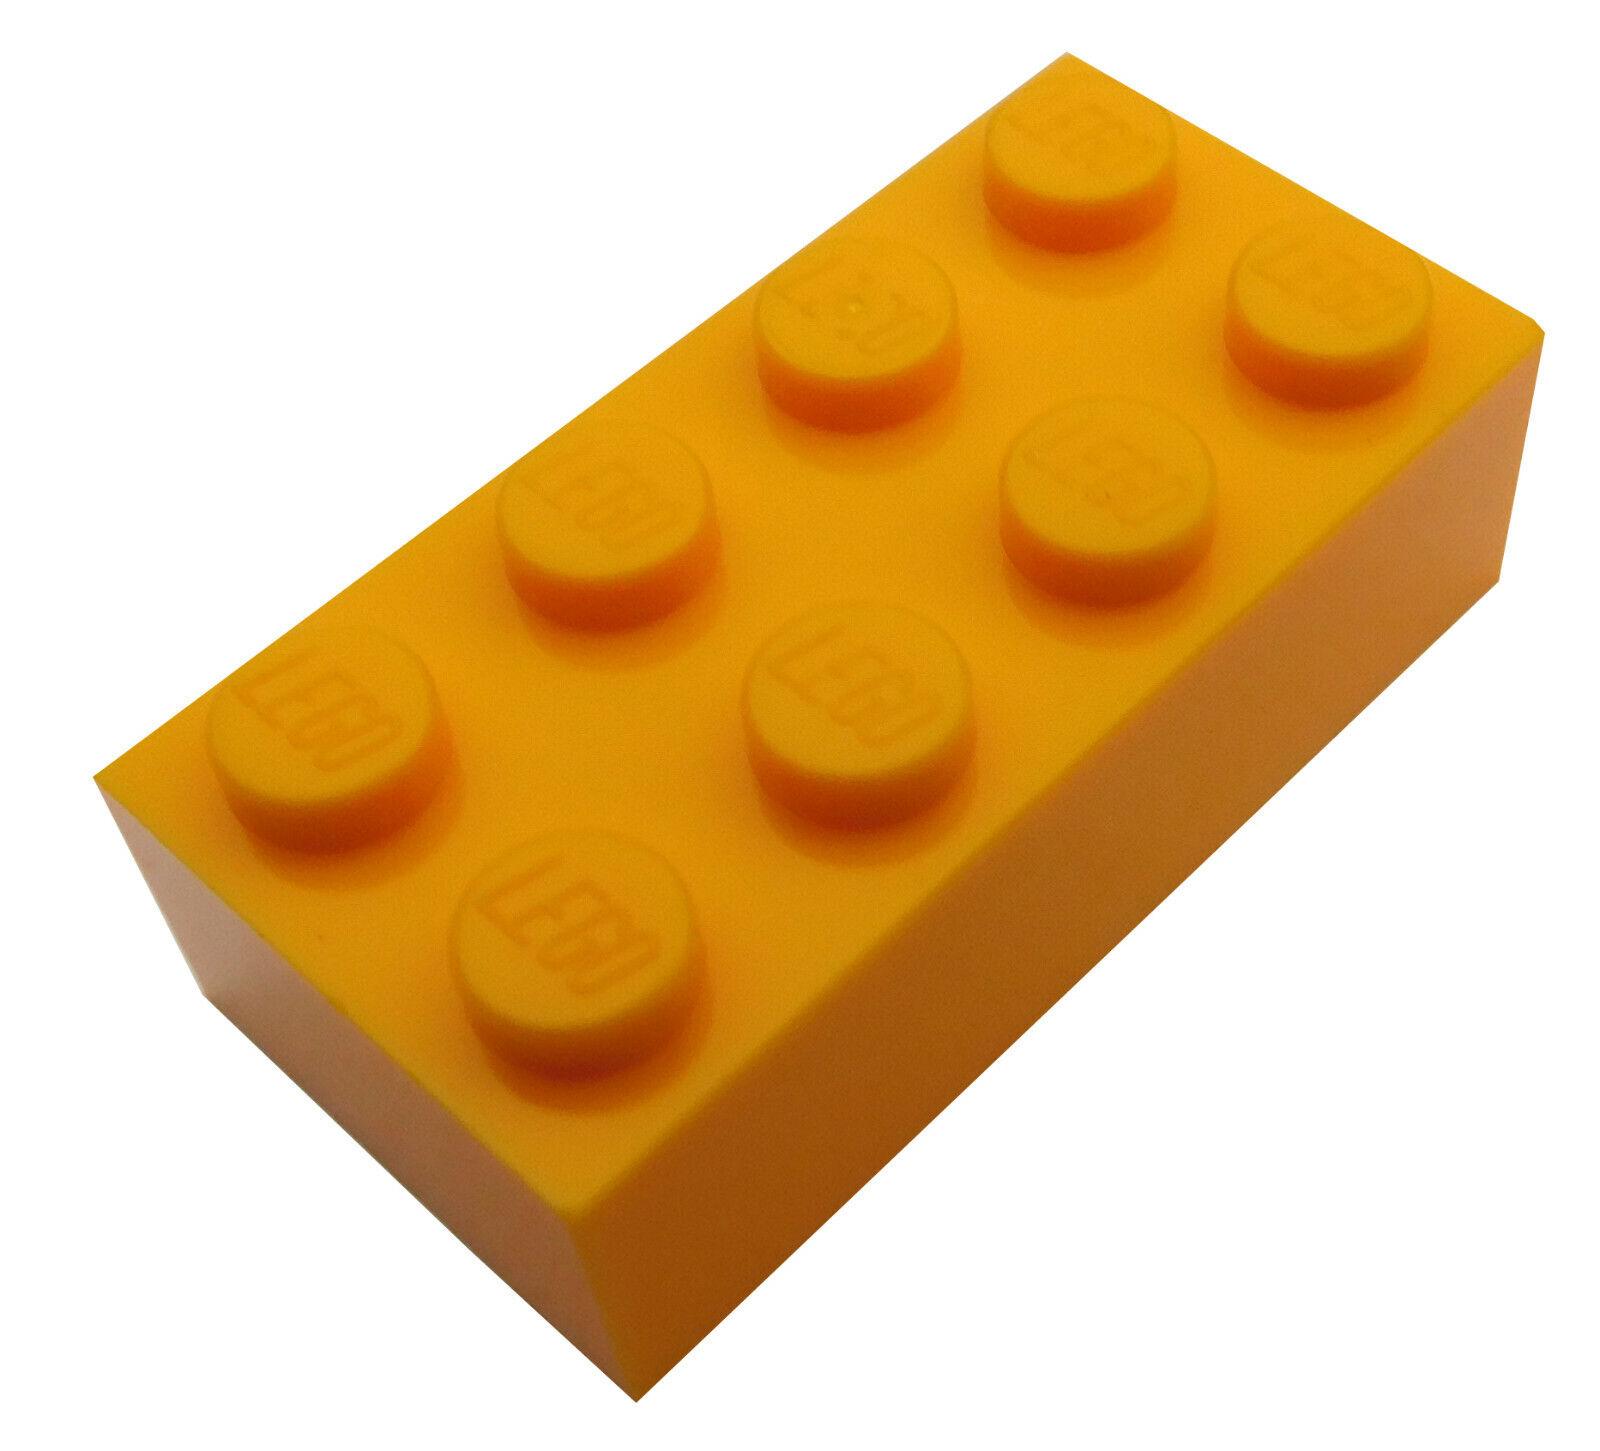 Lego 2 x Bausteine Steine grau 2x4 Basic Bricks Light Bluish Gray 3001 NEU NEW